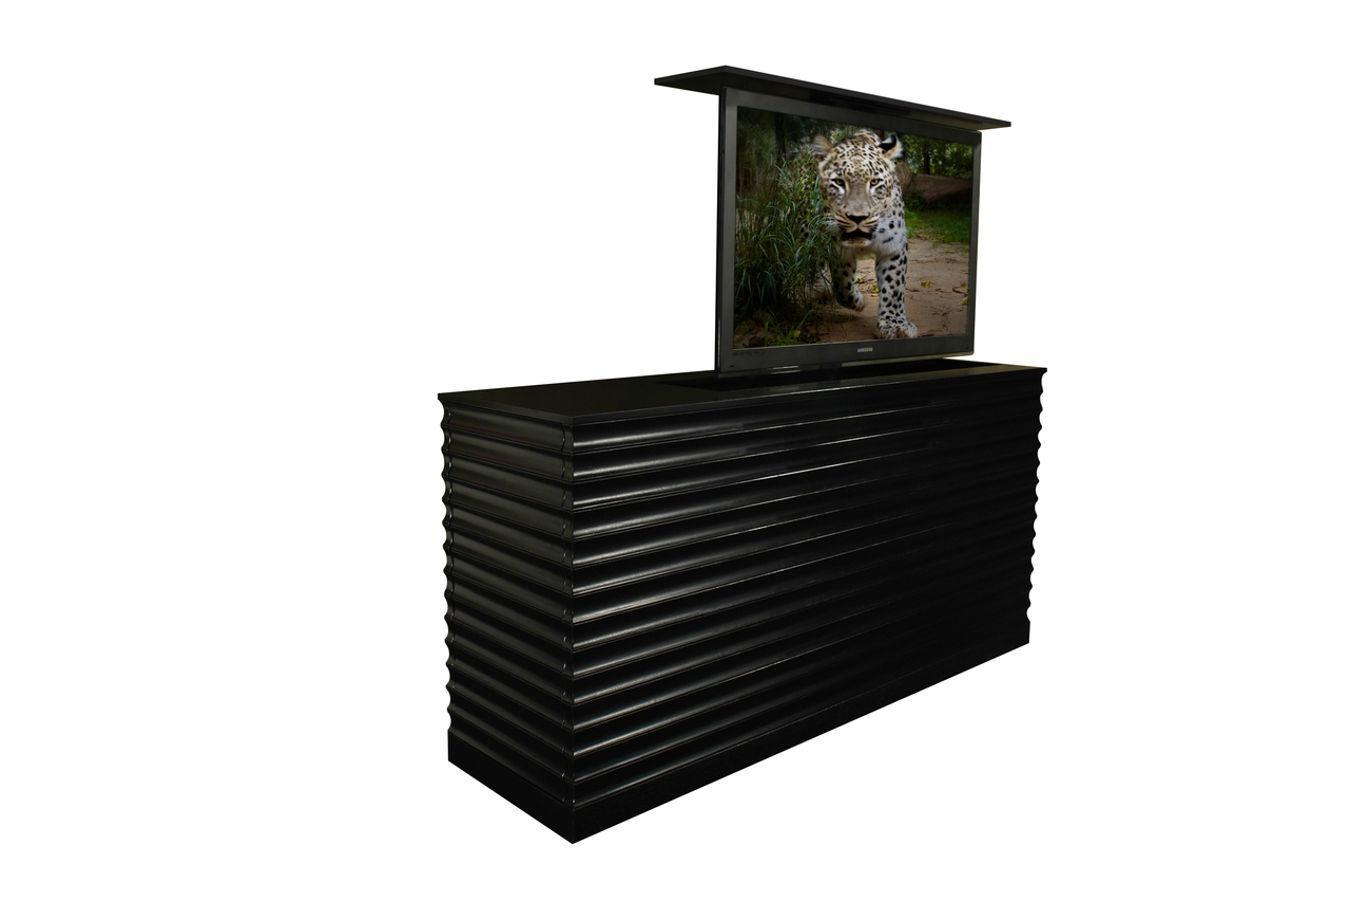 Flat screen tv riser accord ebony tv lift cabinets for Tv lift consoles for flat screens